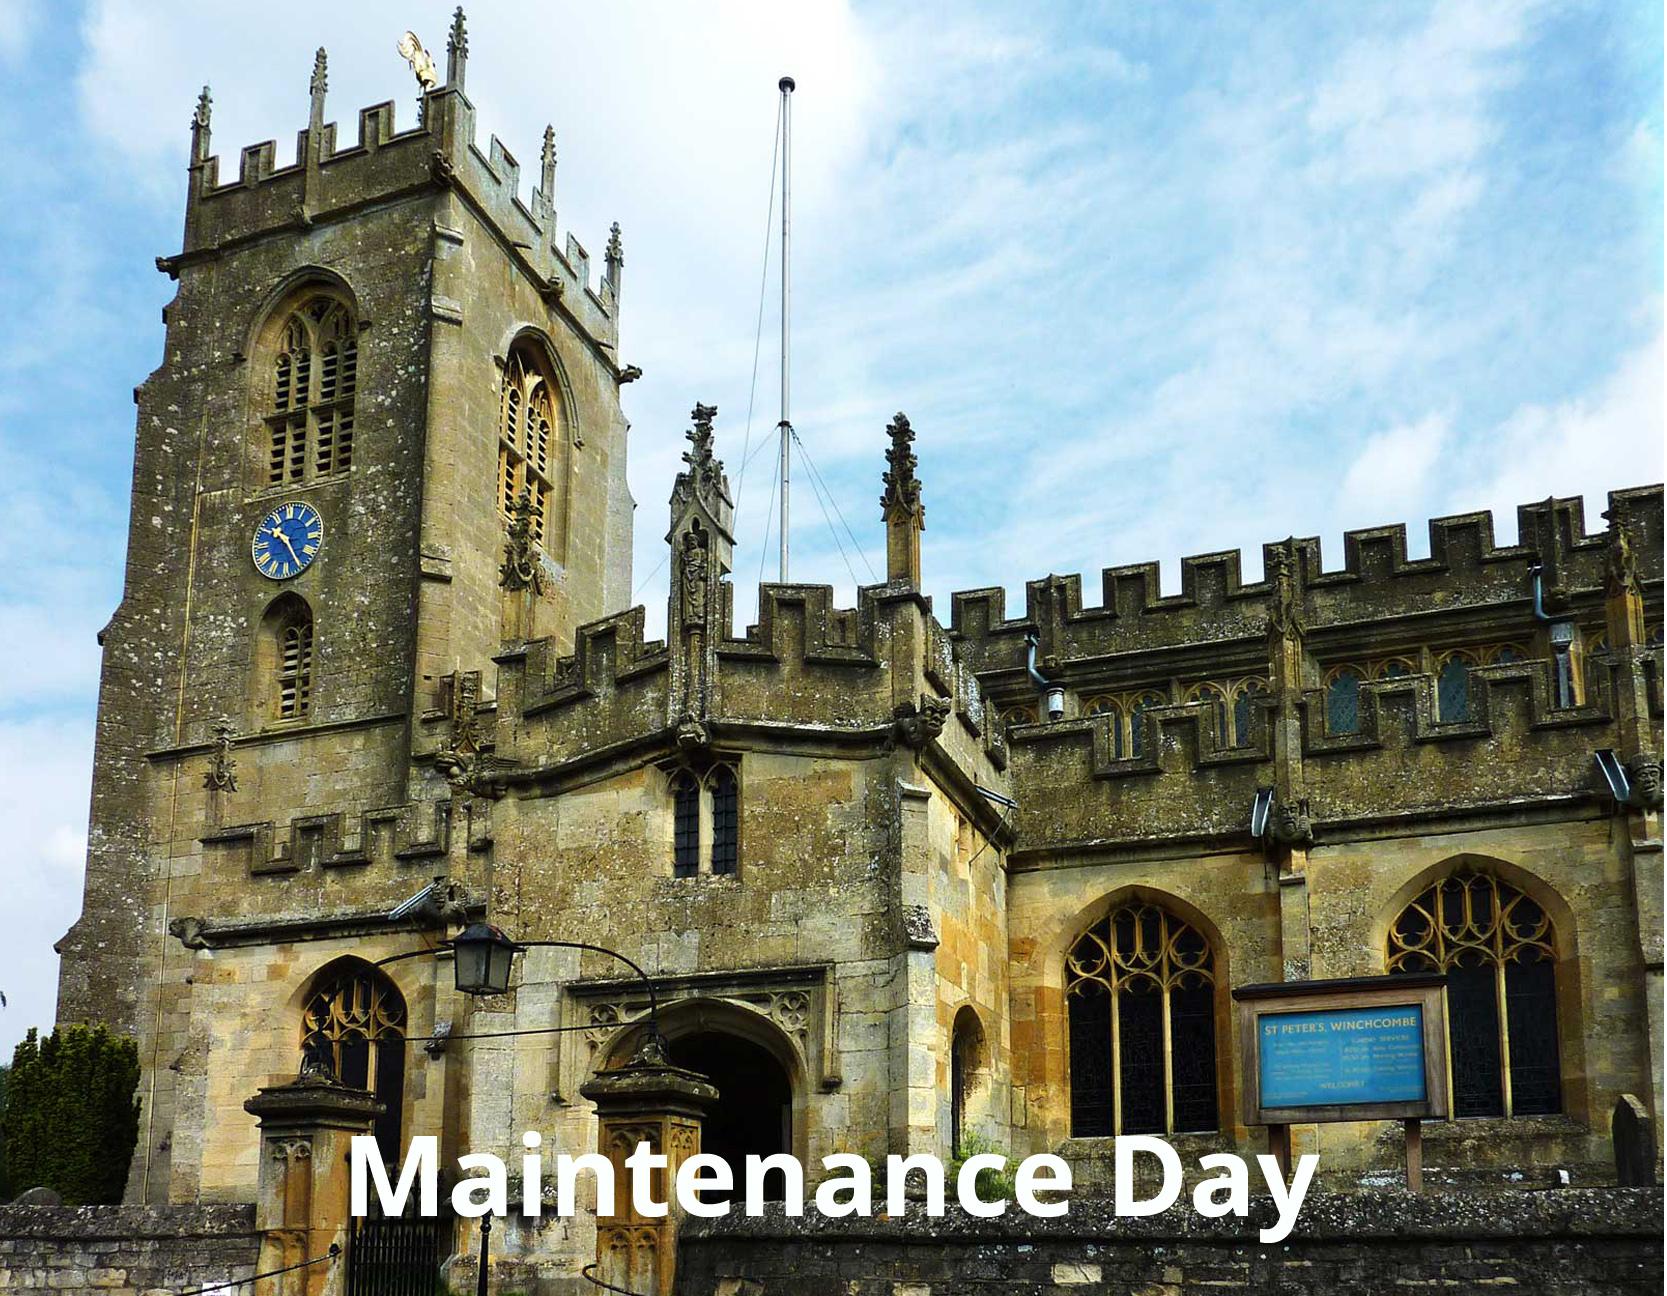 St Peter's Church Maintenance Day